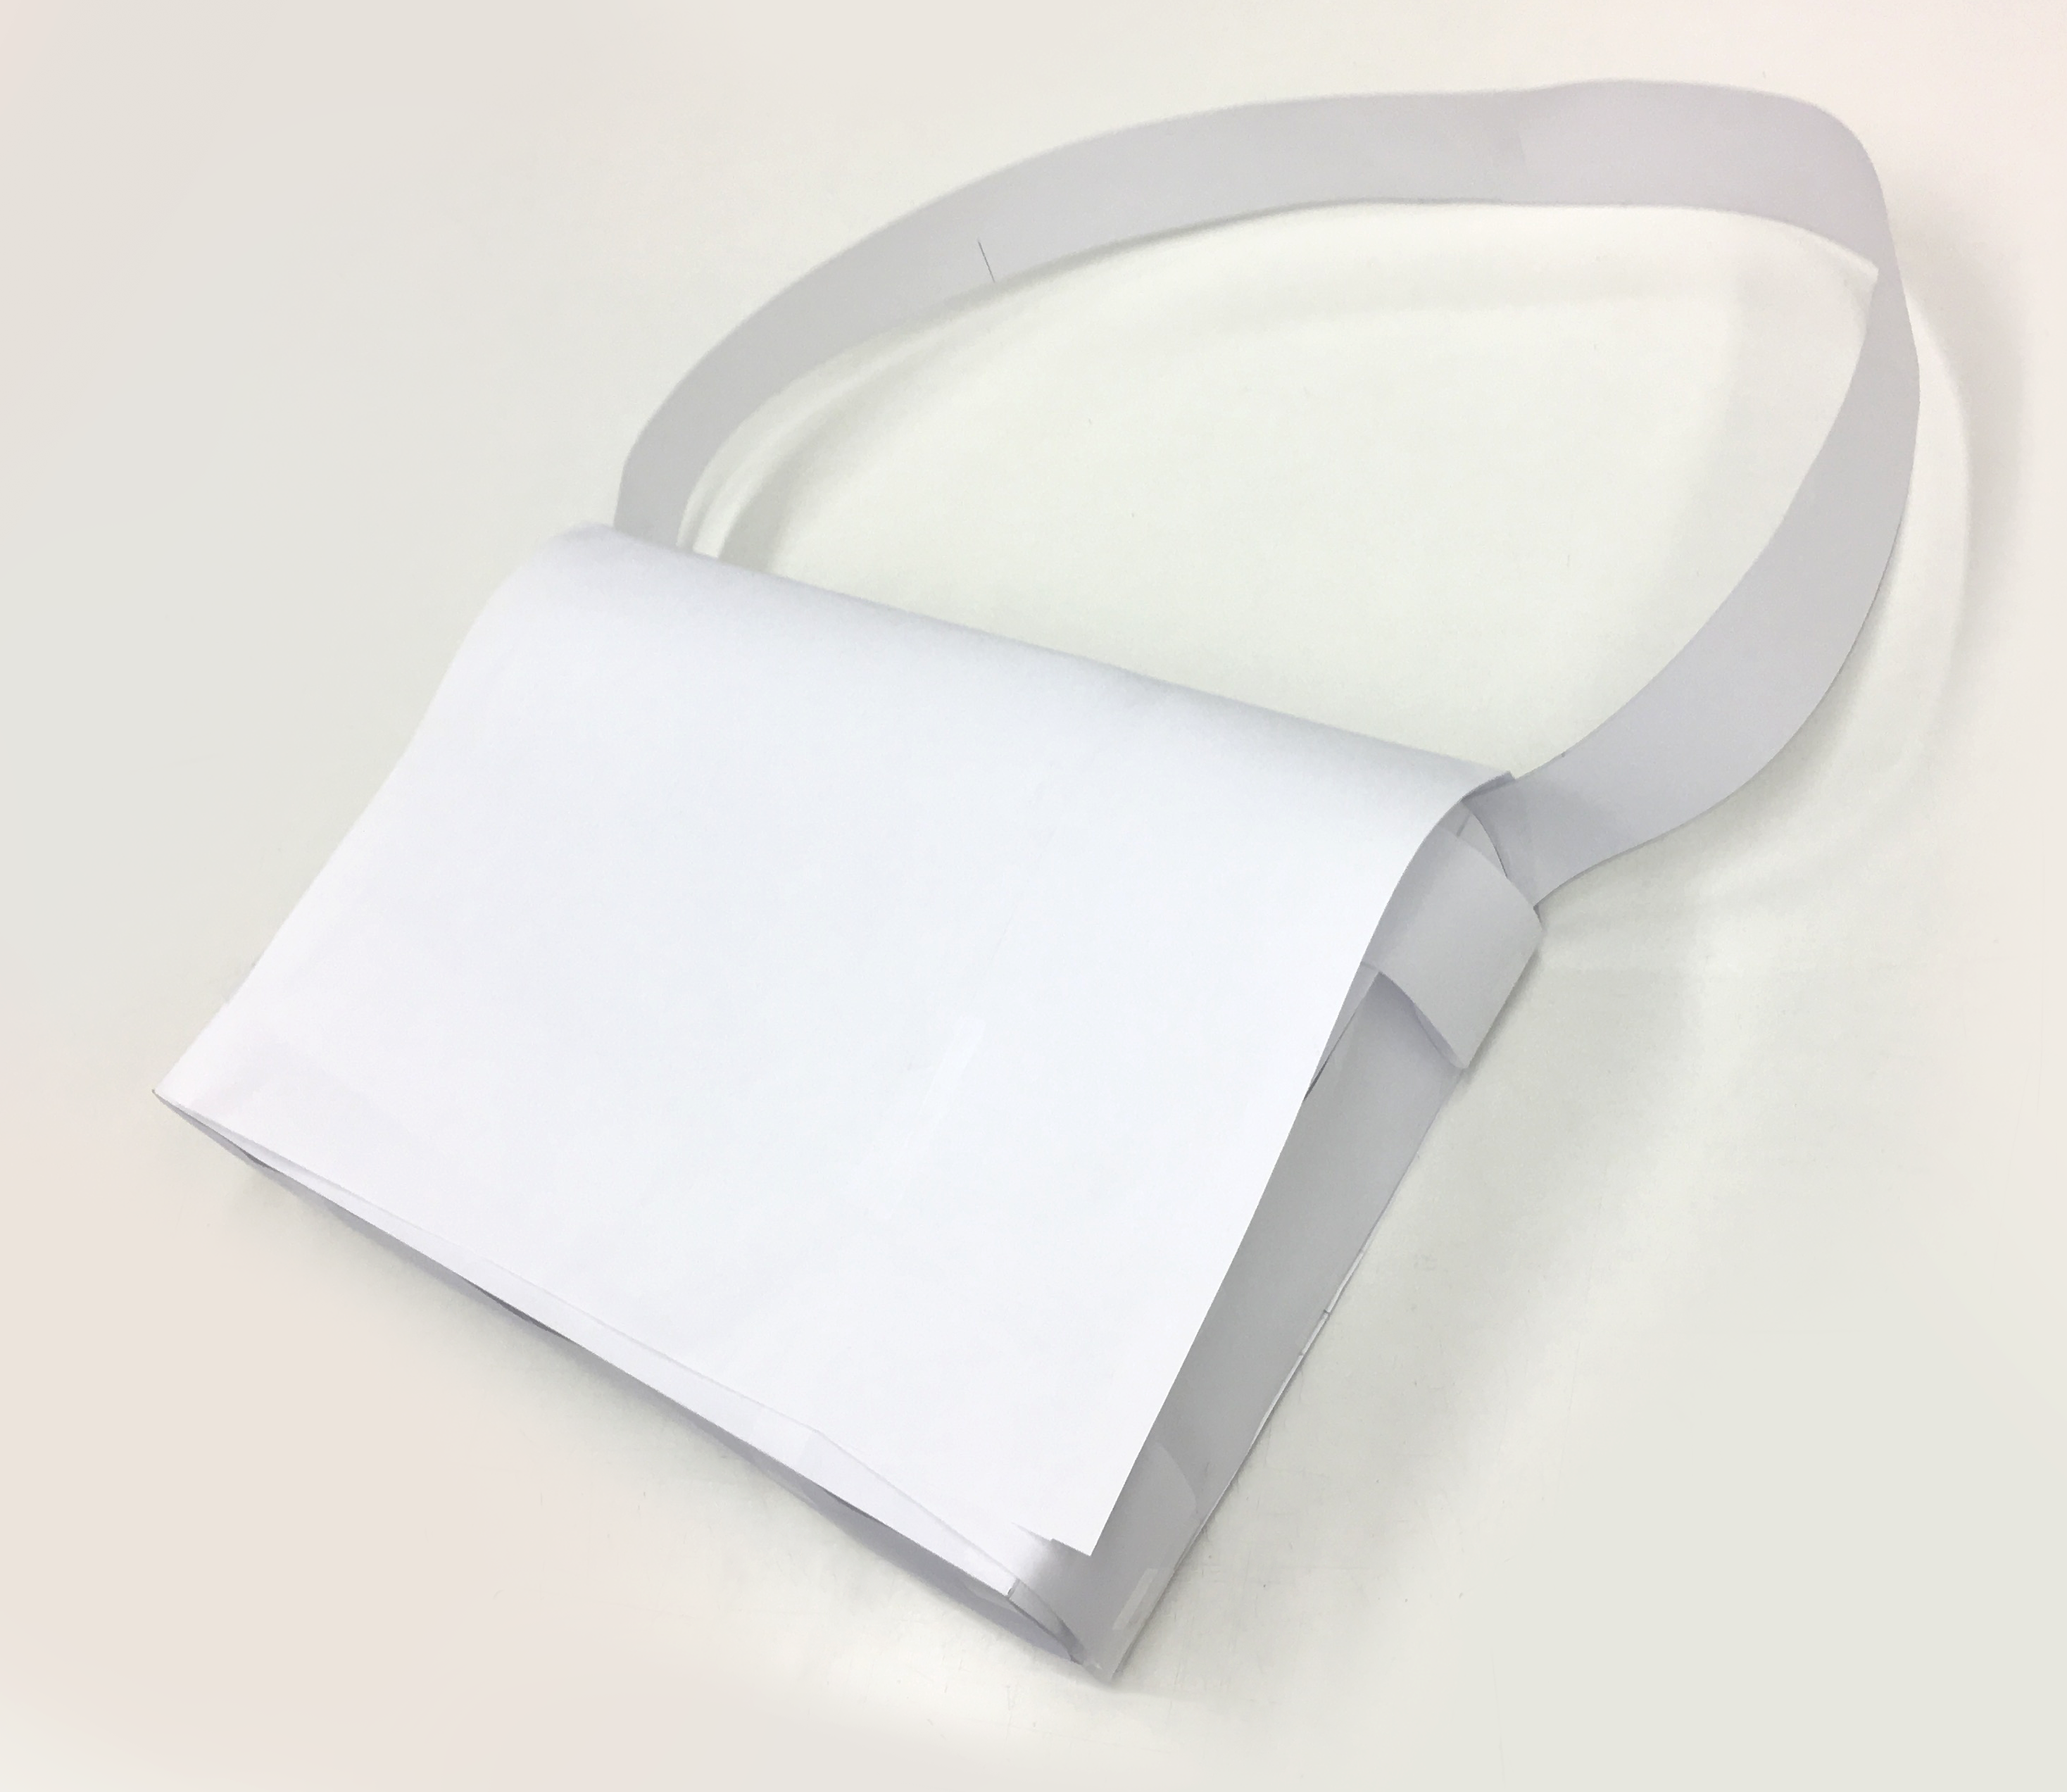 Prototype Messenger Bag